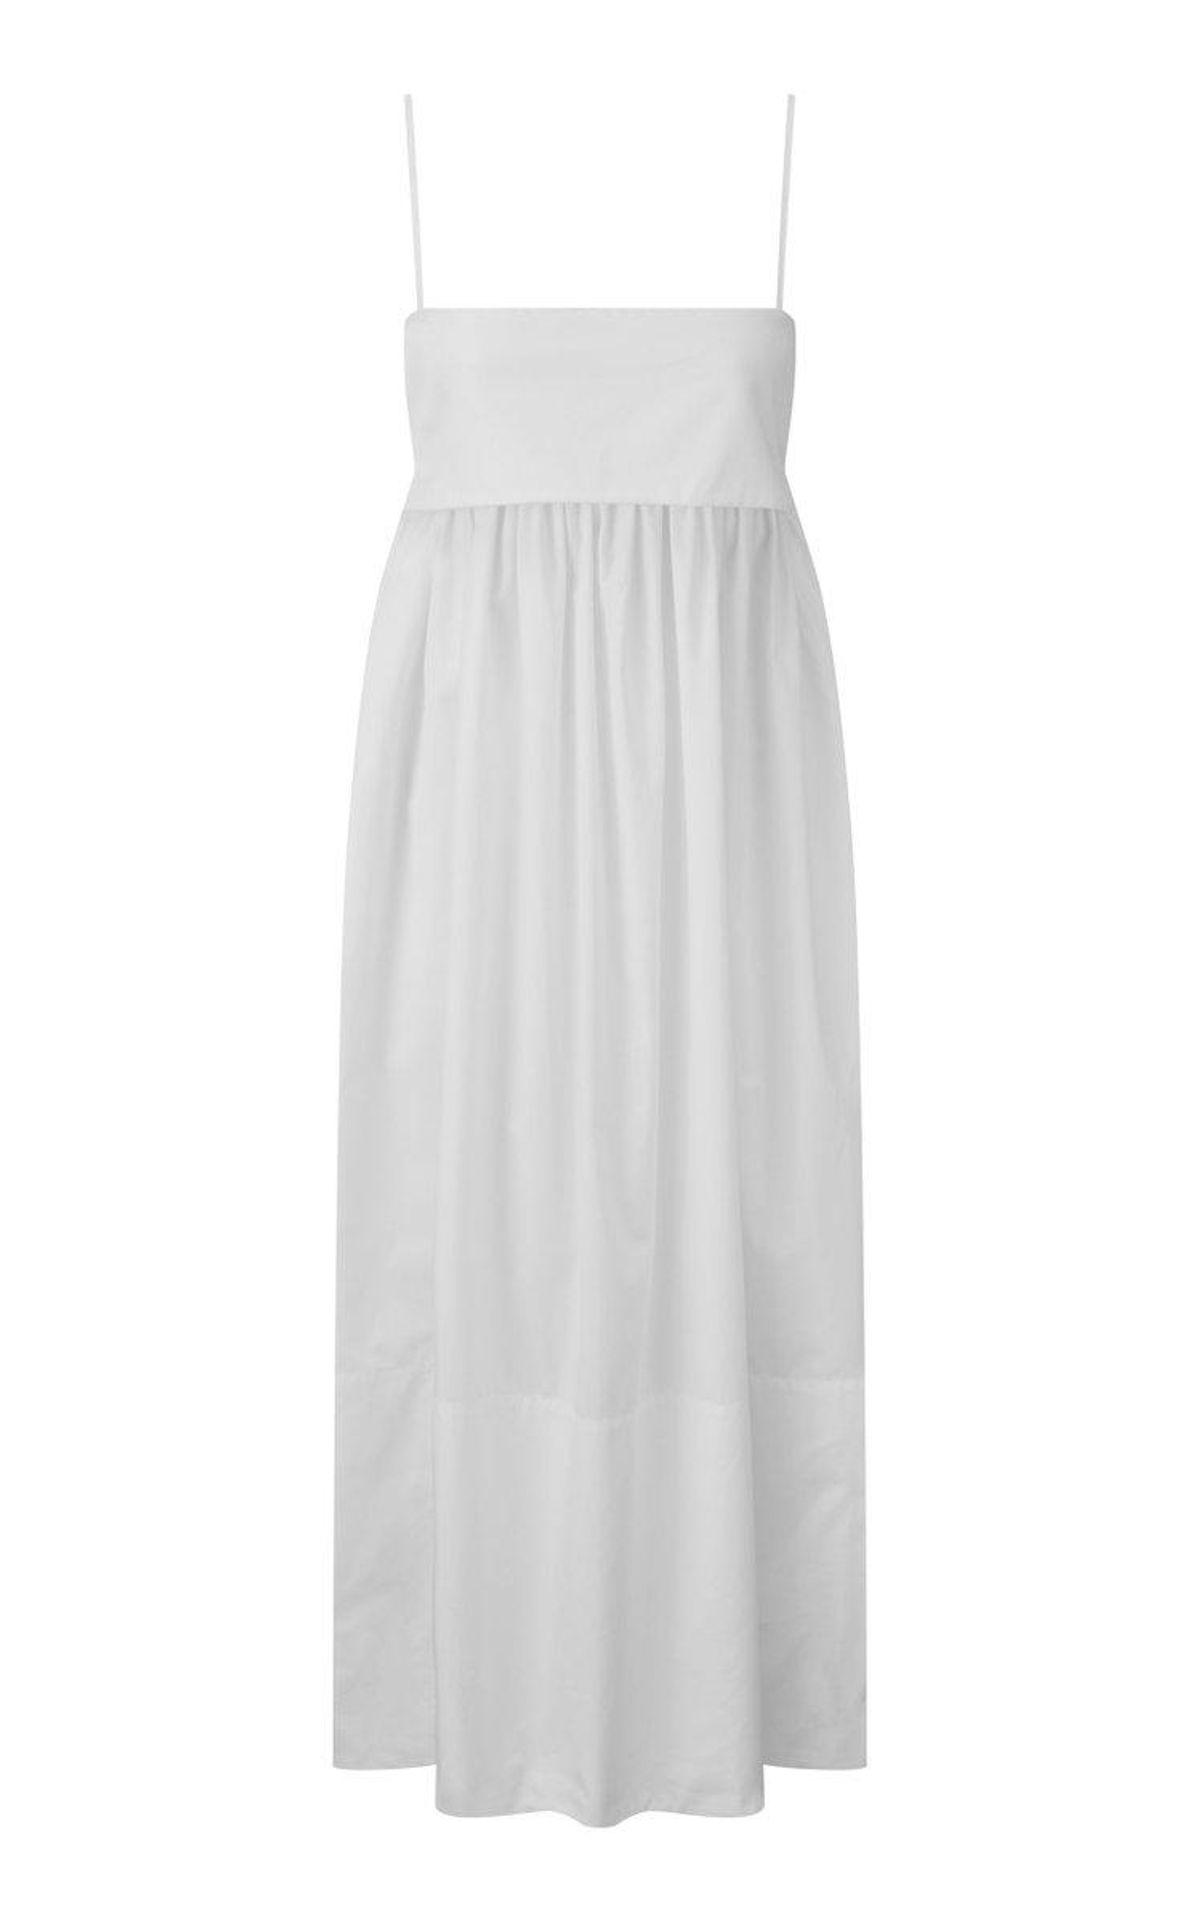 Structured Bandeau Cotton Babydoll Dress